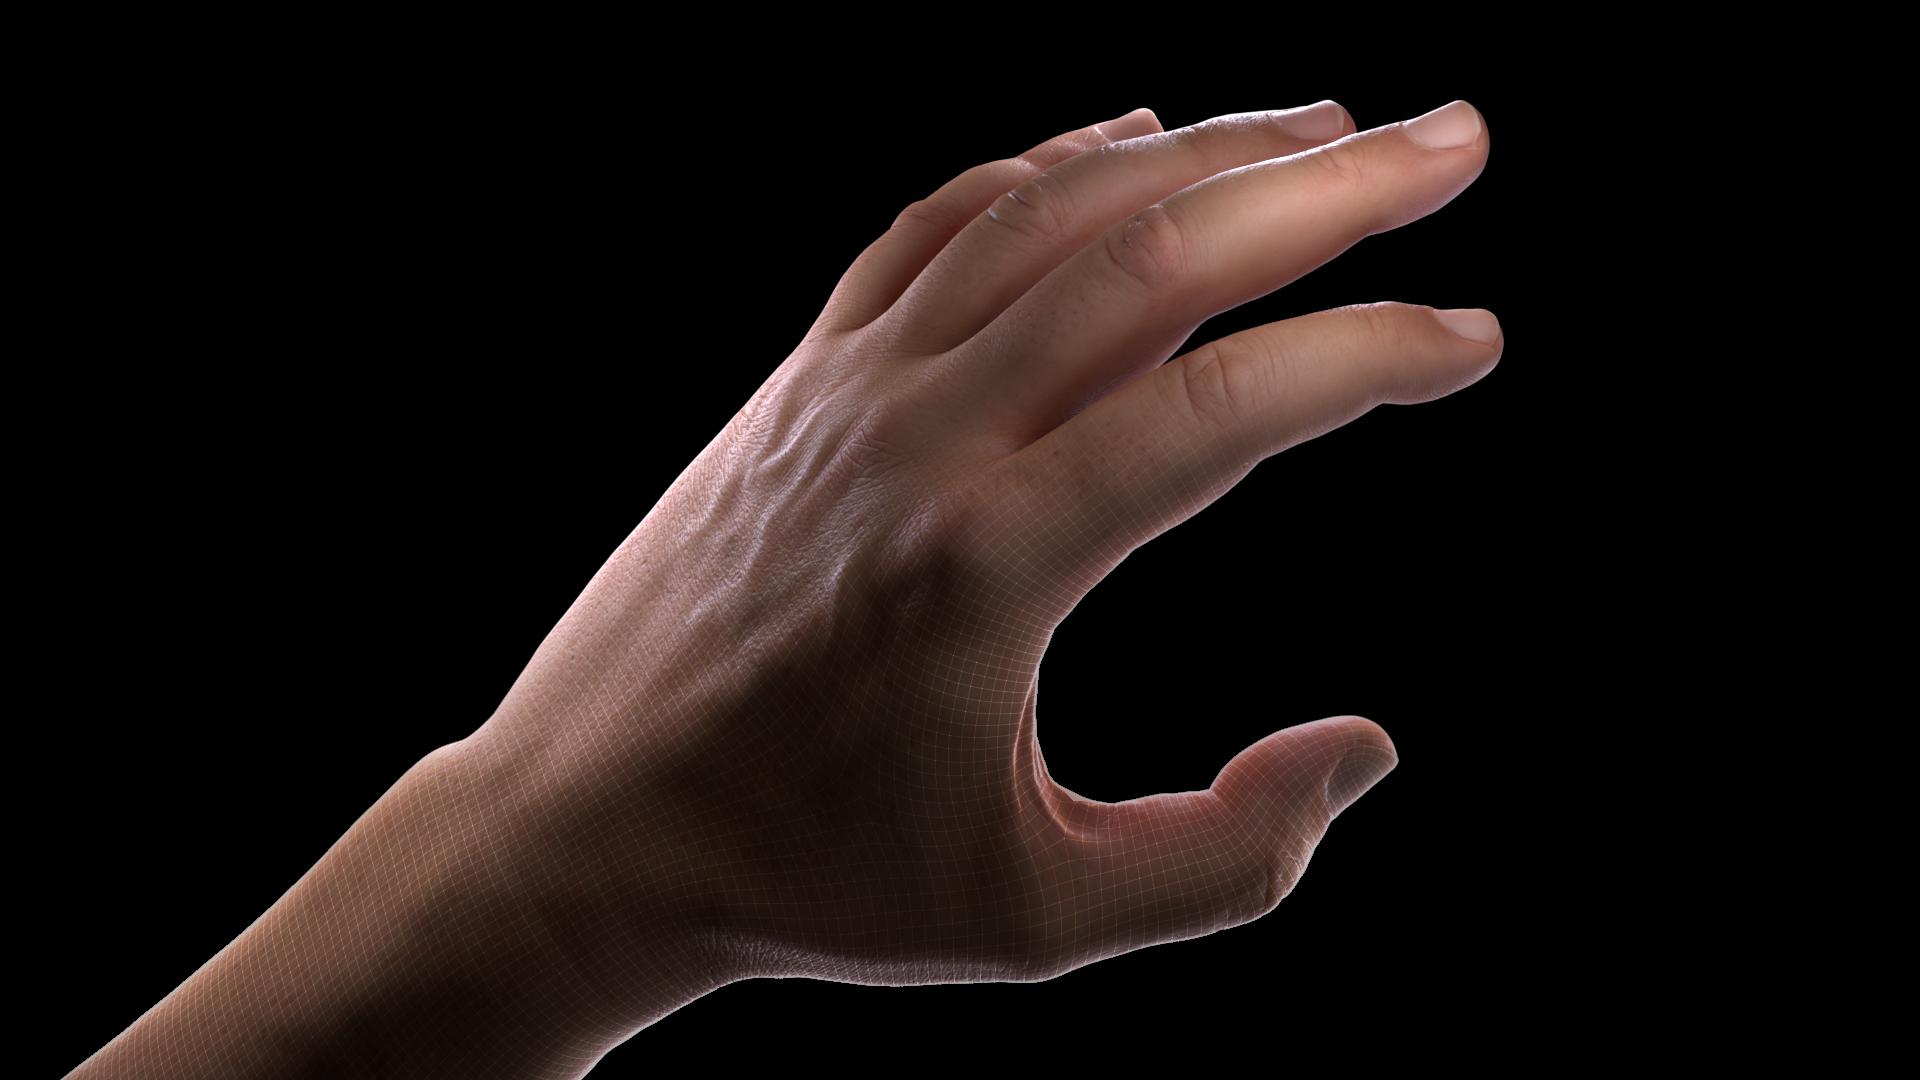 hand_F01_11_frame175_cc_hero2